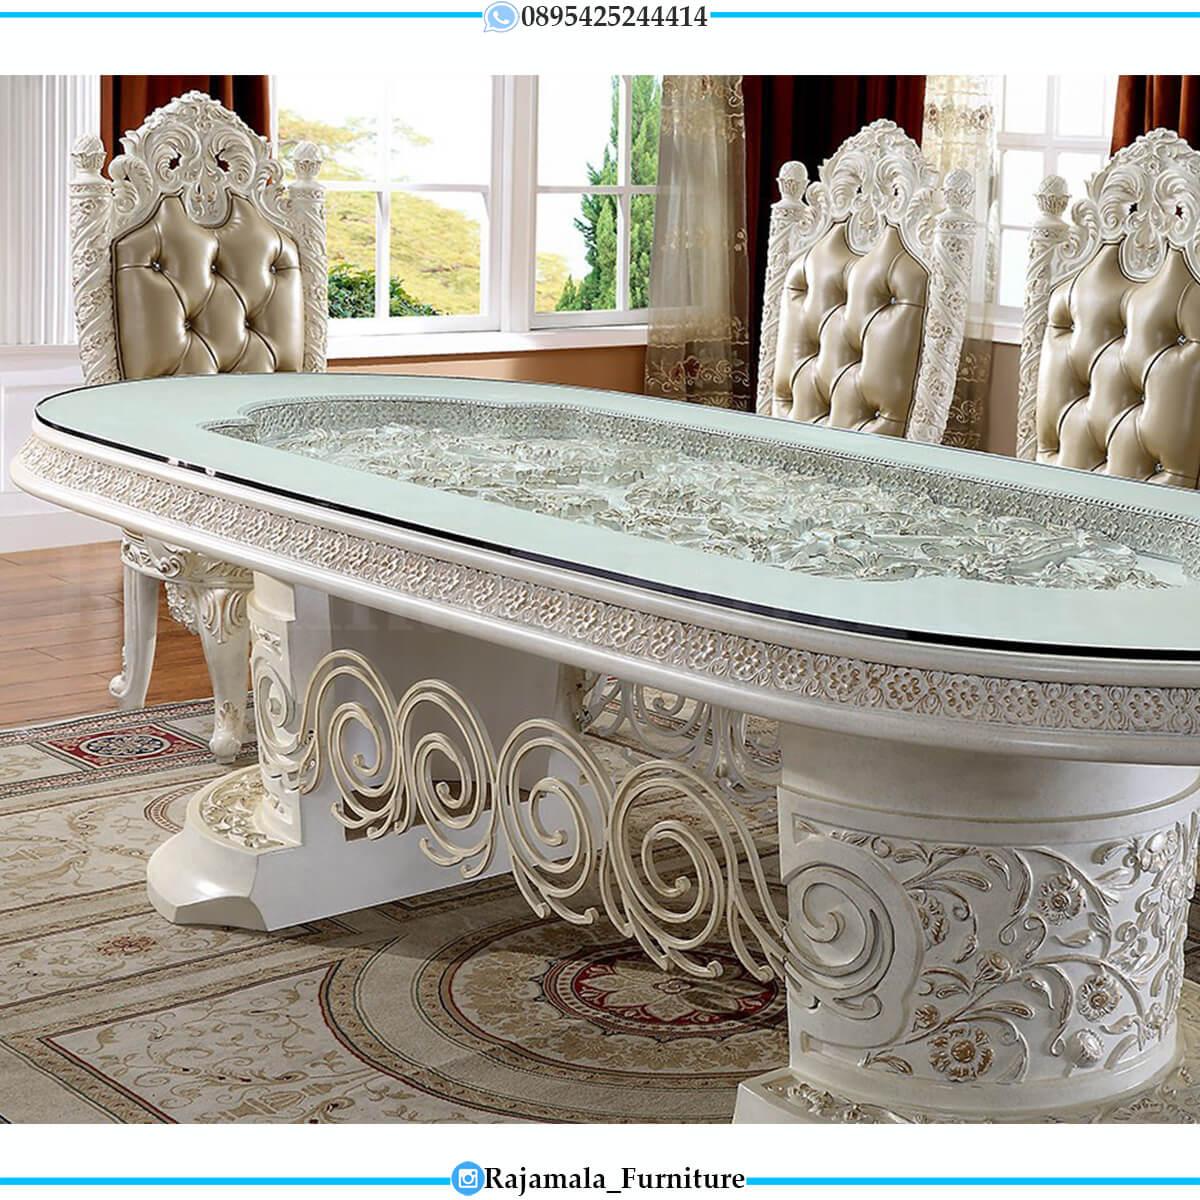 New Set Meja Makan Mewah Luxury Carving Italian Empire Style RM-0715